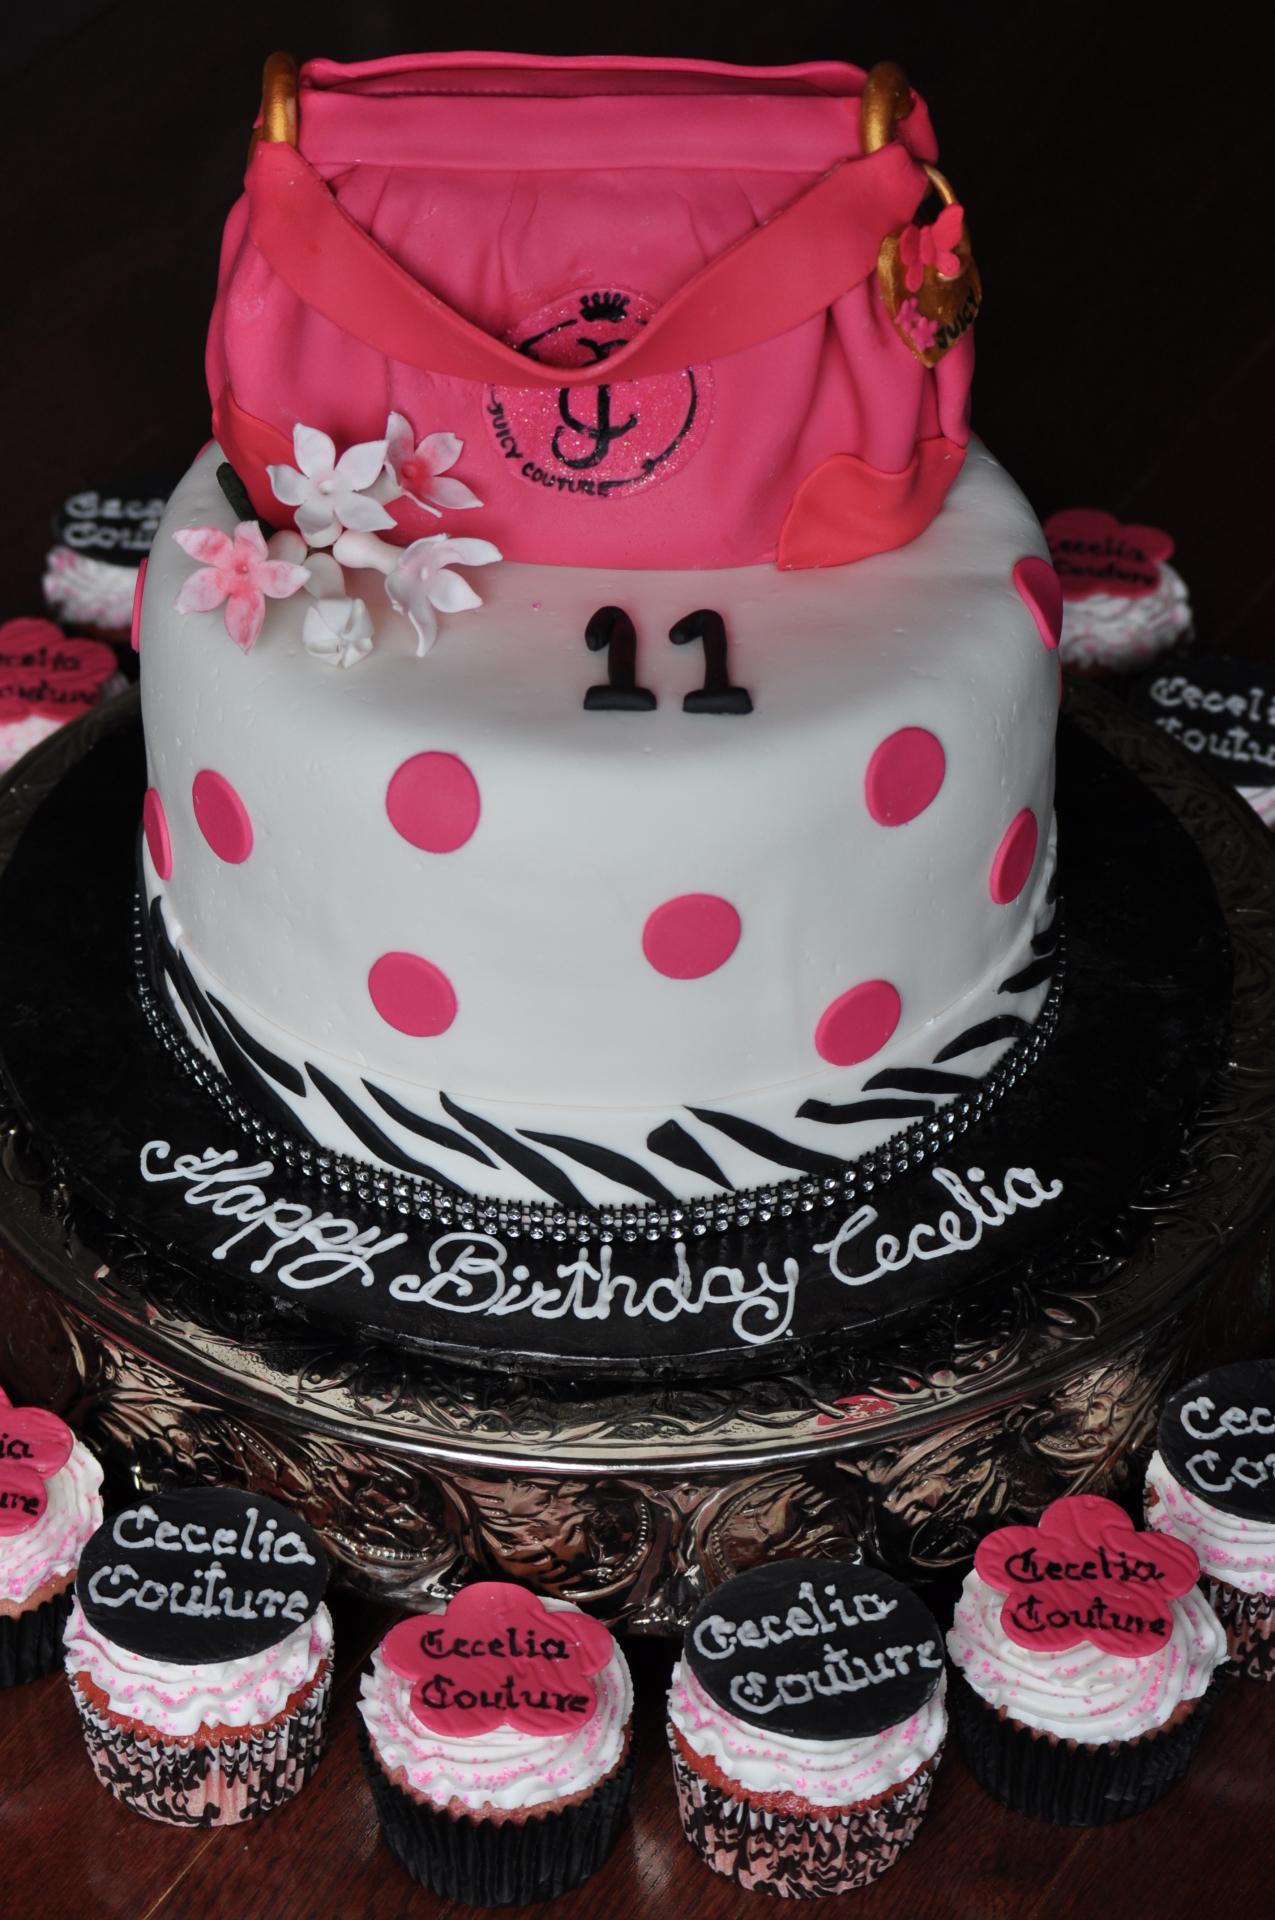 Purse cake, handbag cake, glam cake cupcakes